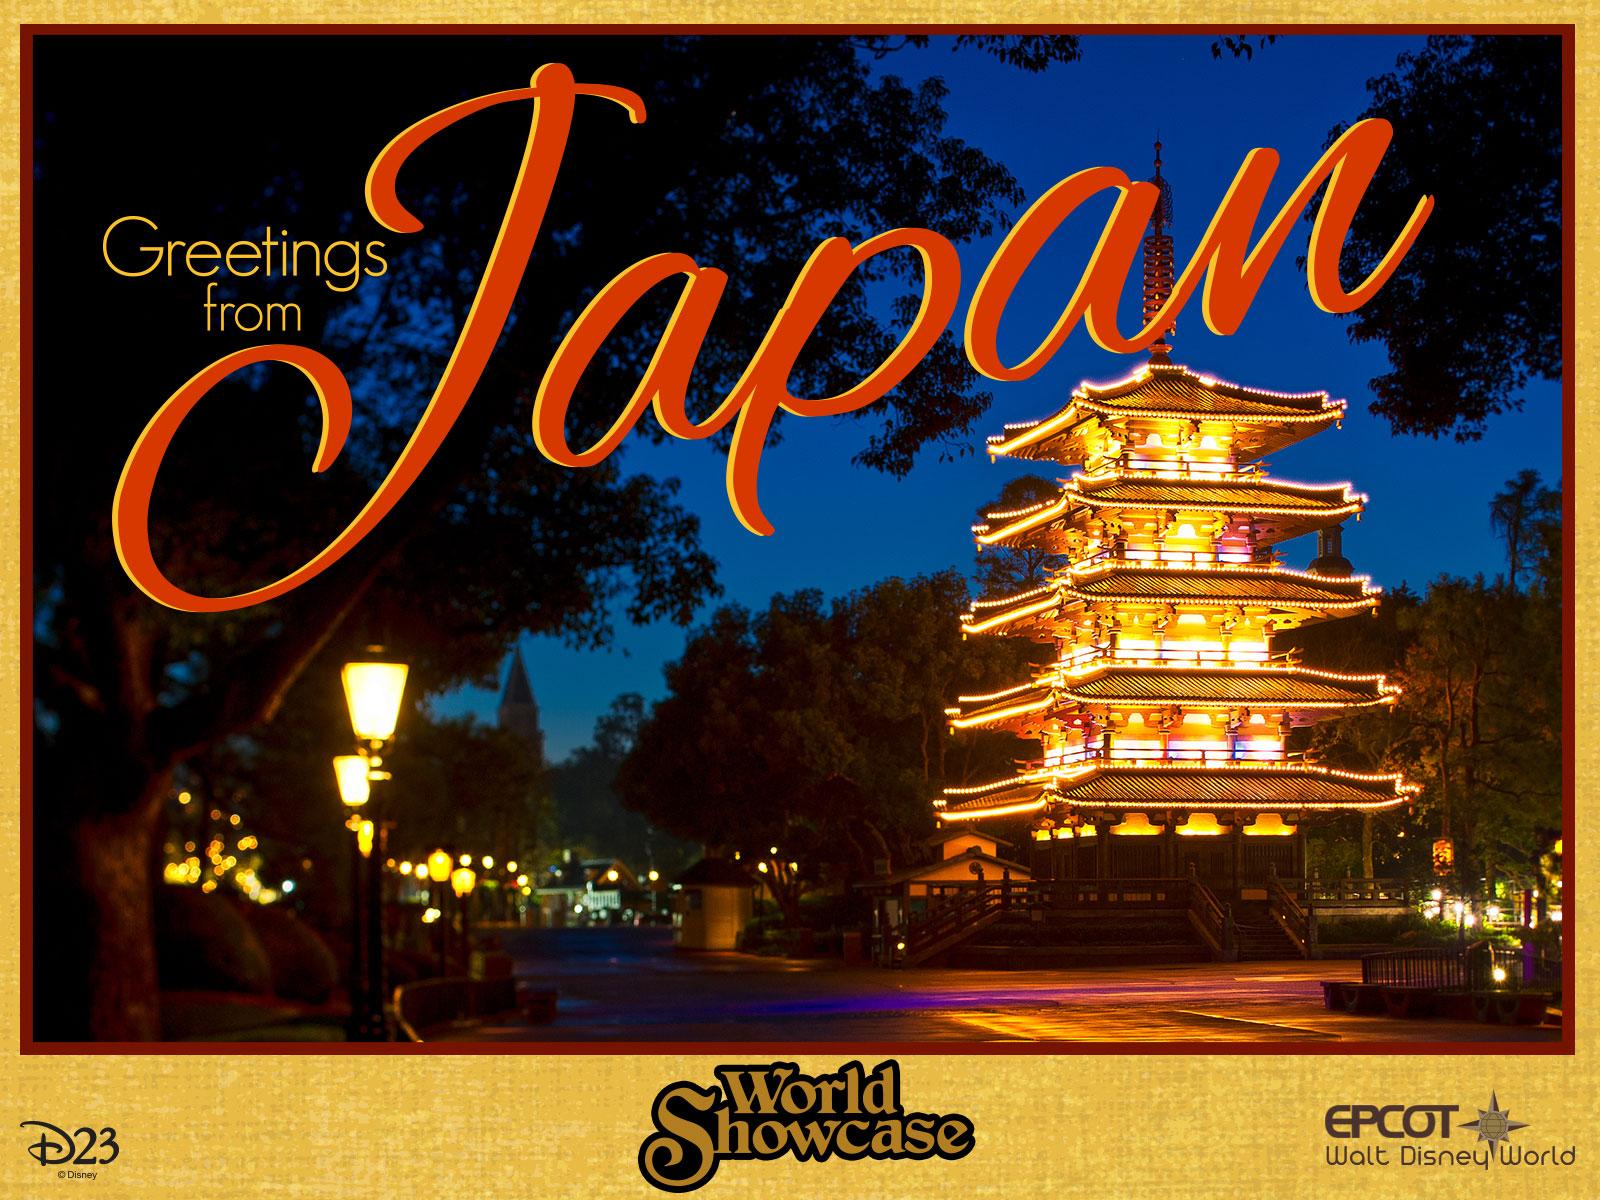 Japan pavilion postcard